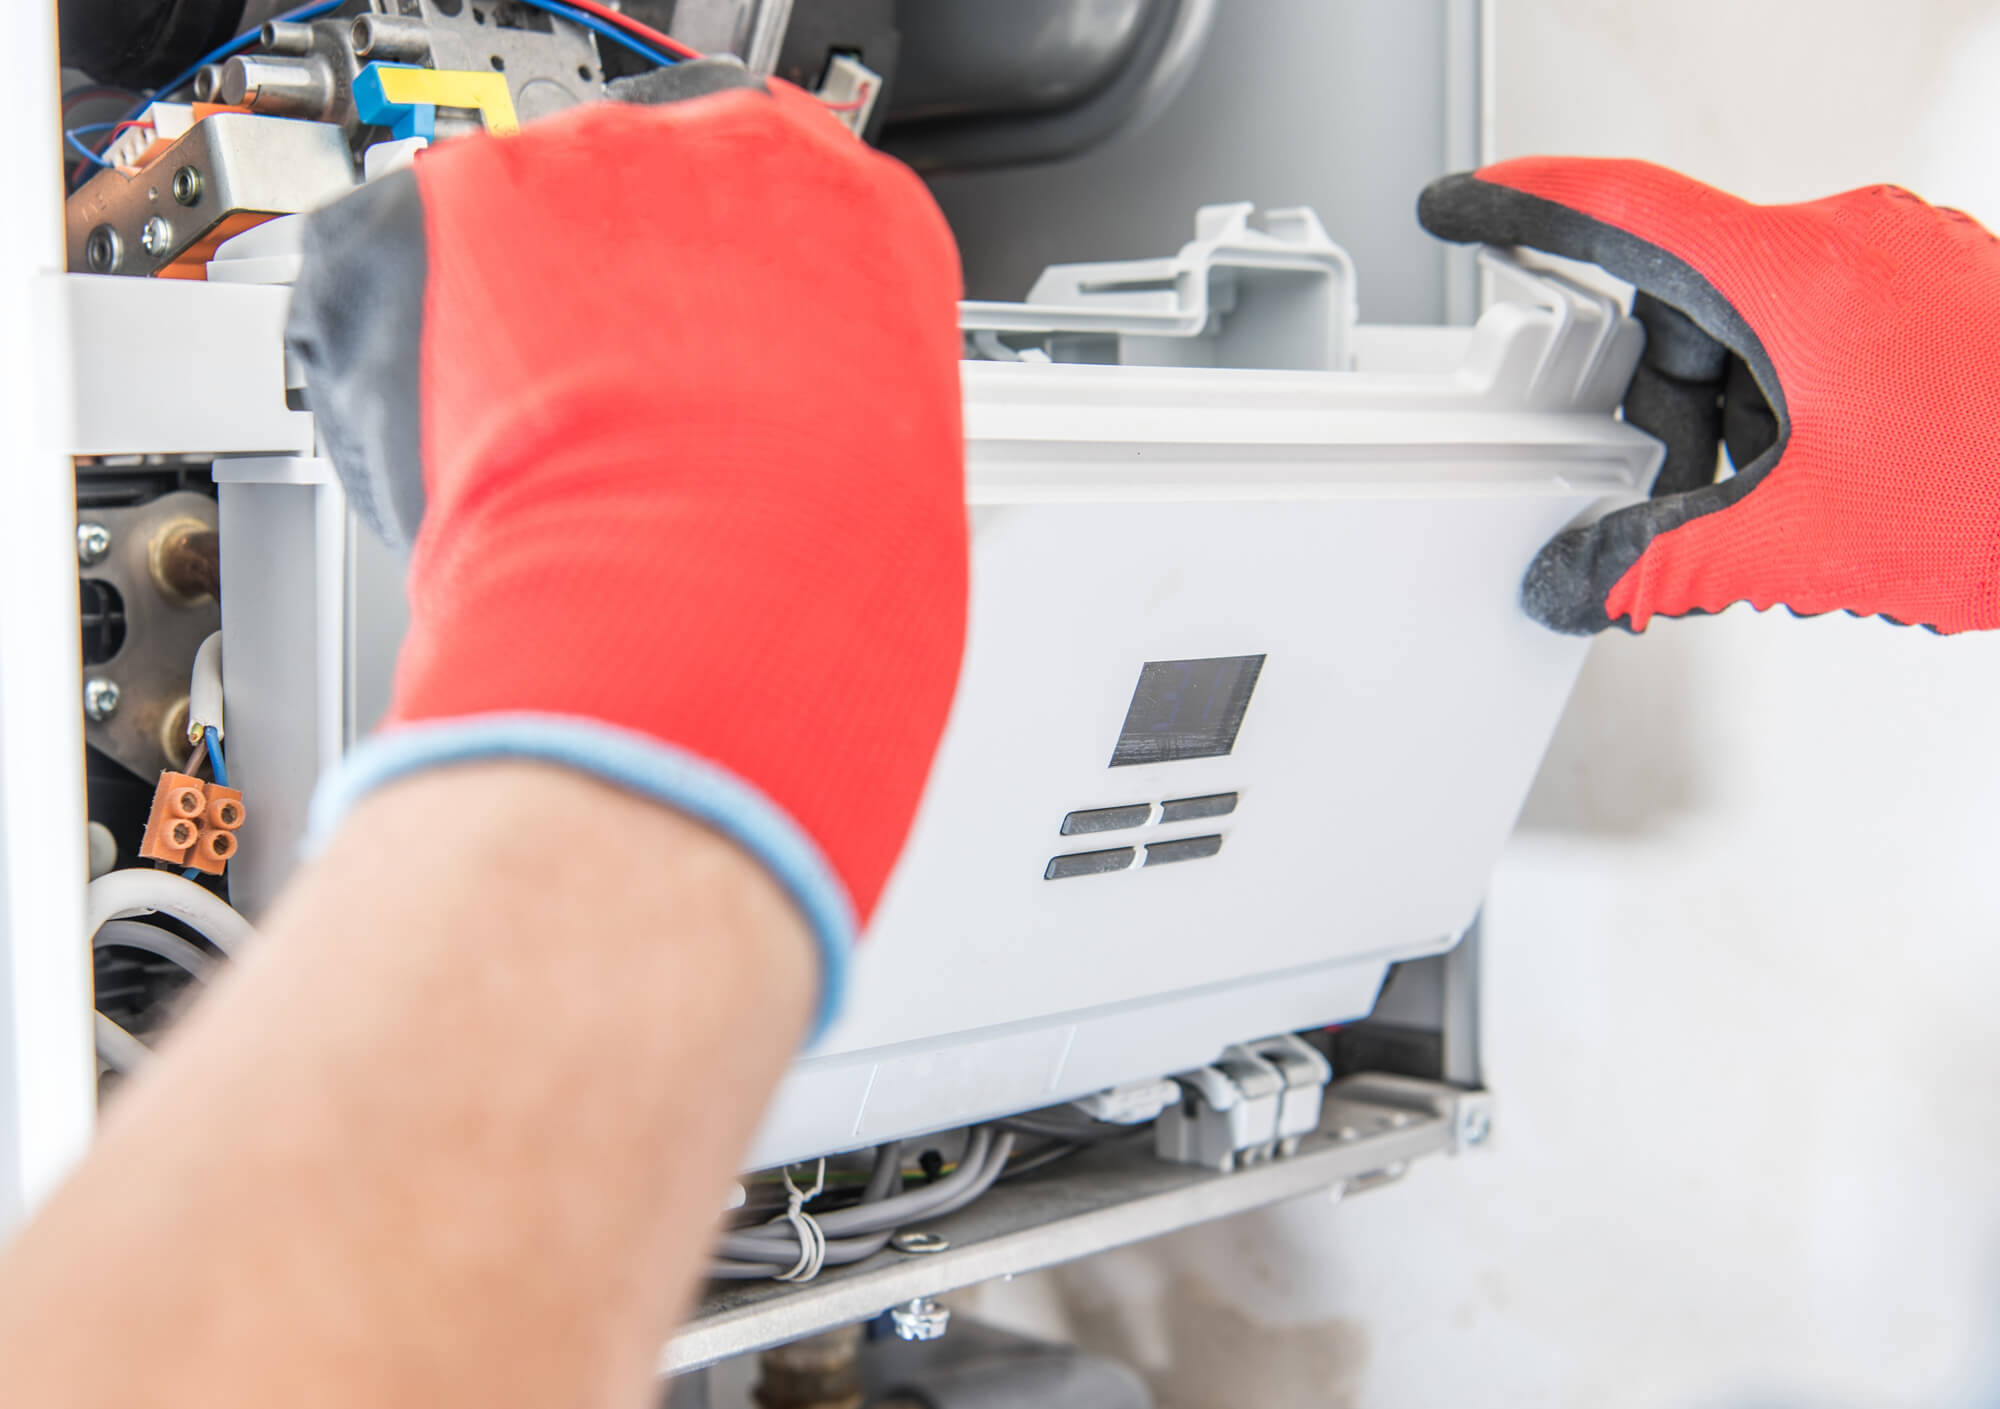 Fixing the boiler